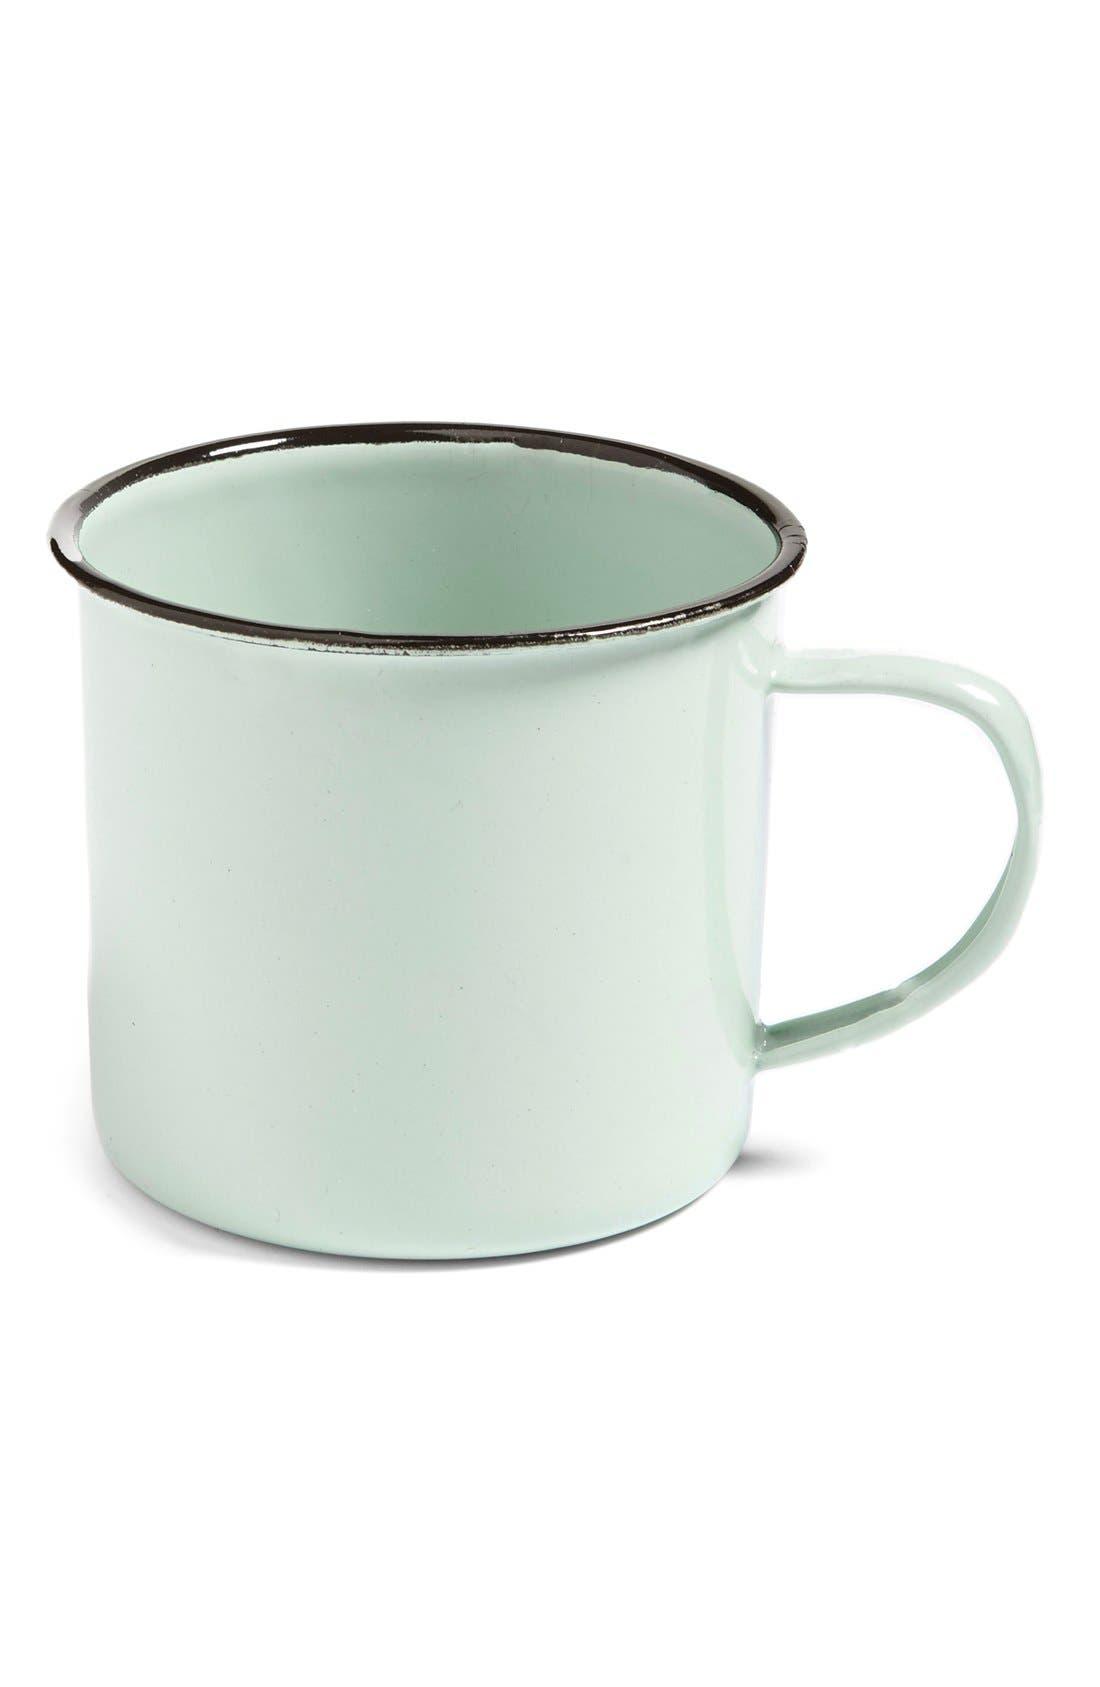 Main Image - Park Hill Collection Mug